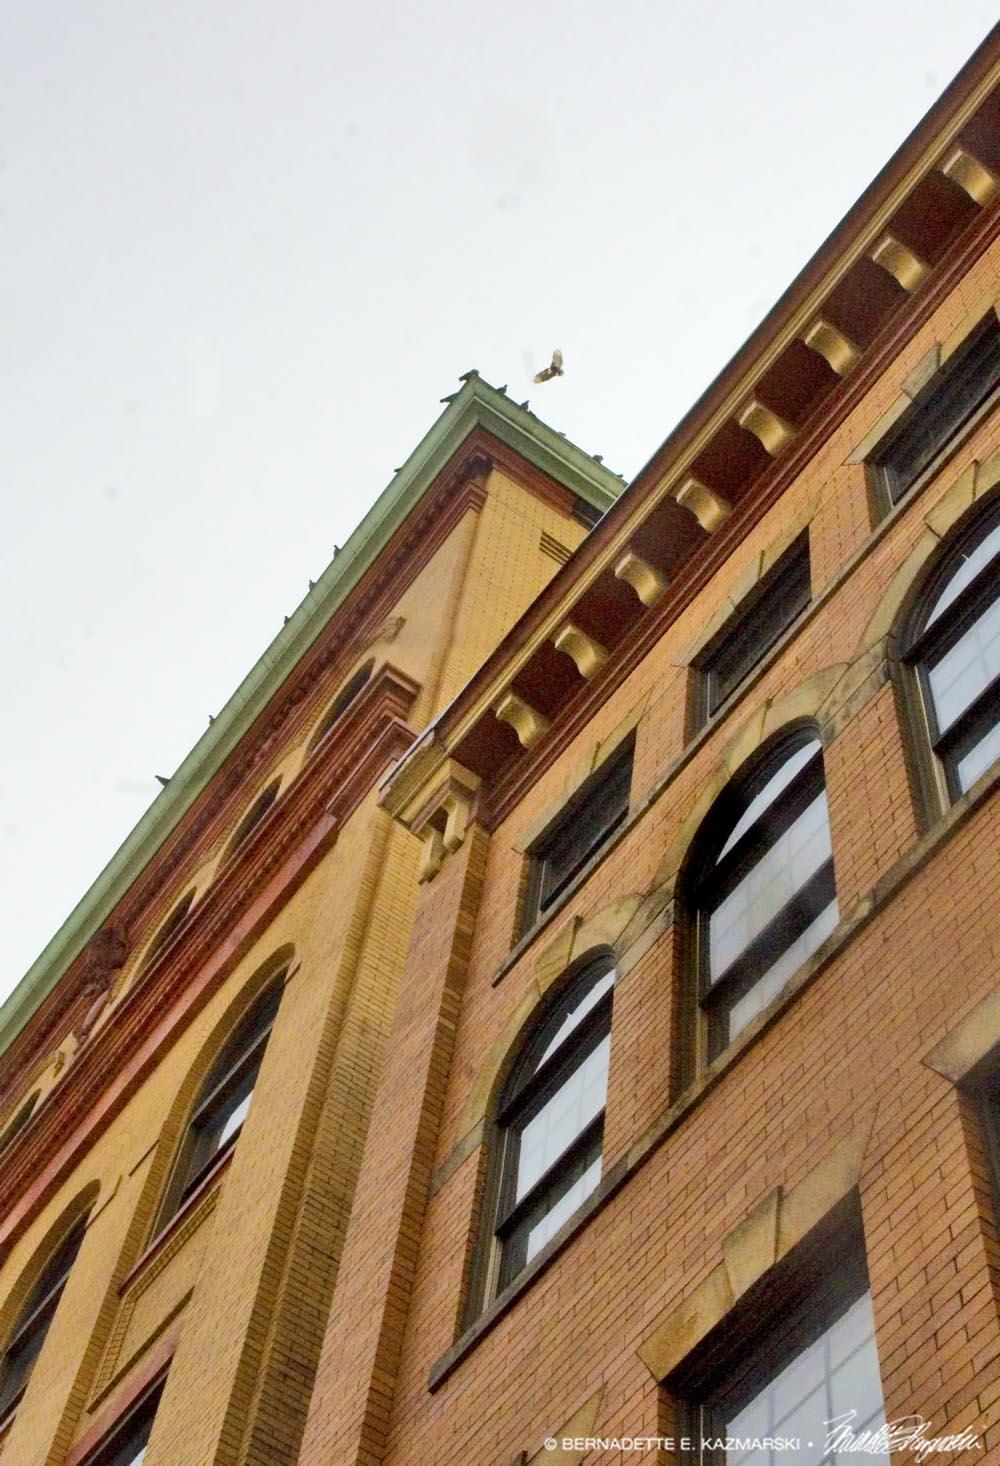 dove landing on building